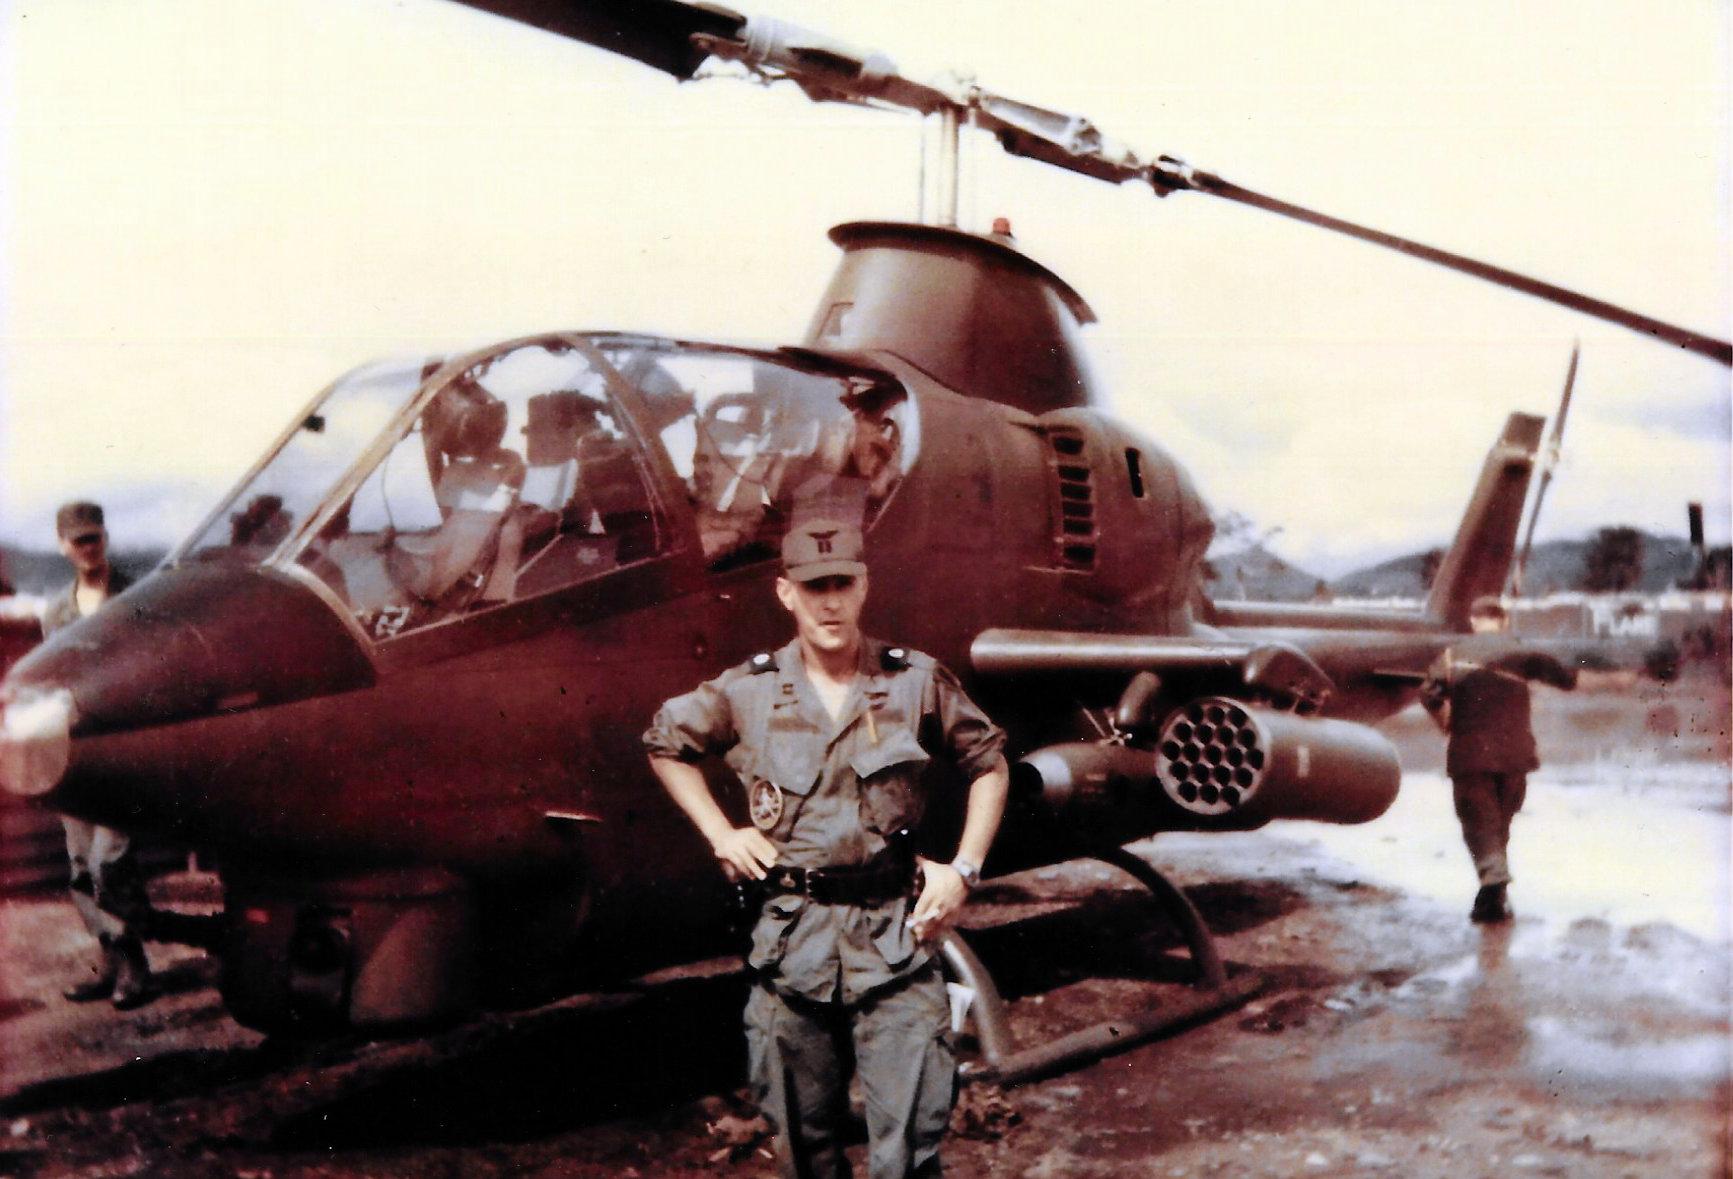 1968 - Harold Goldman's Cobra Gunship